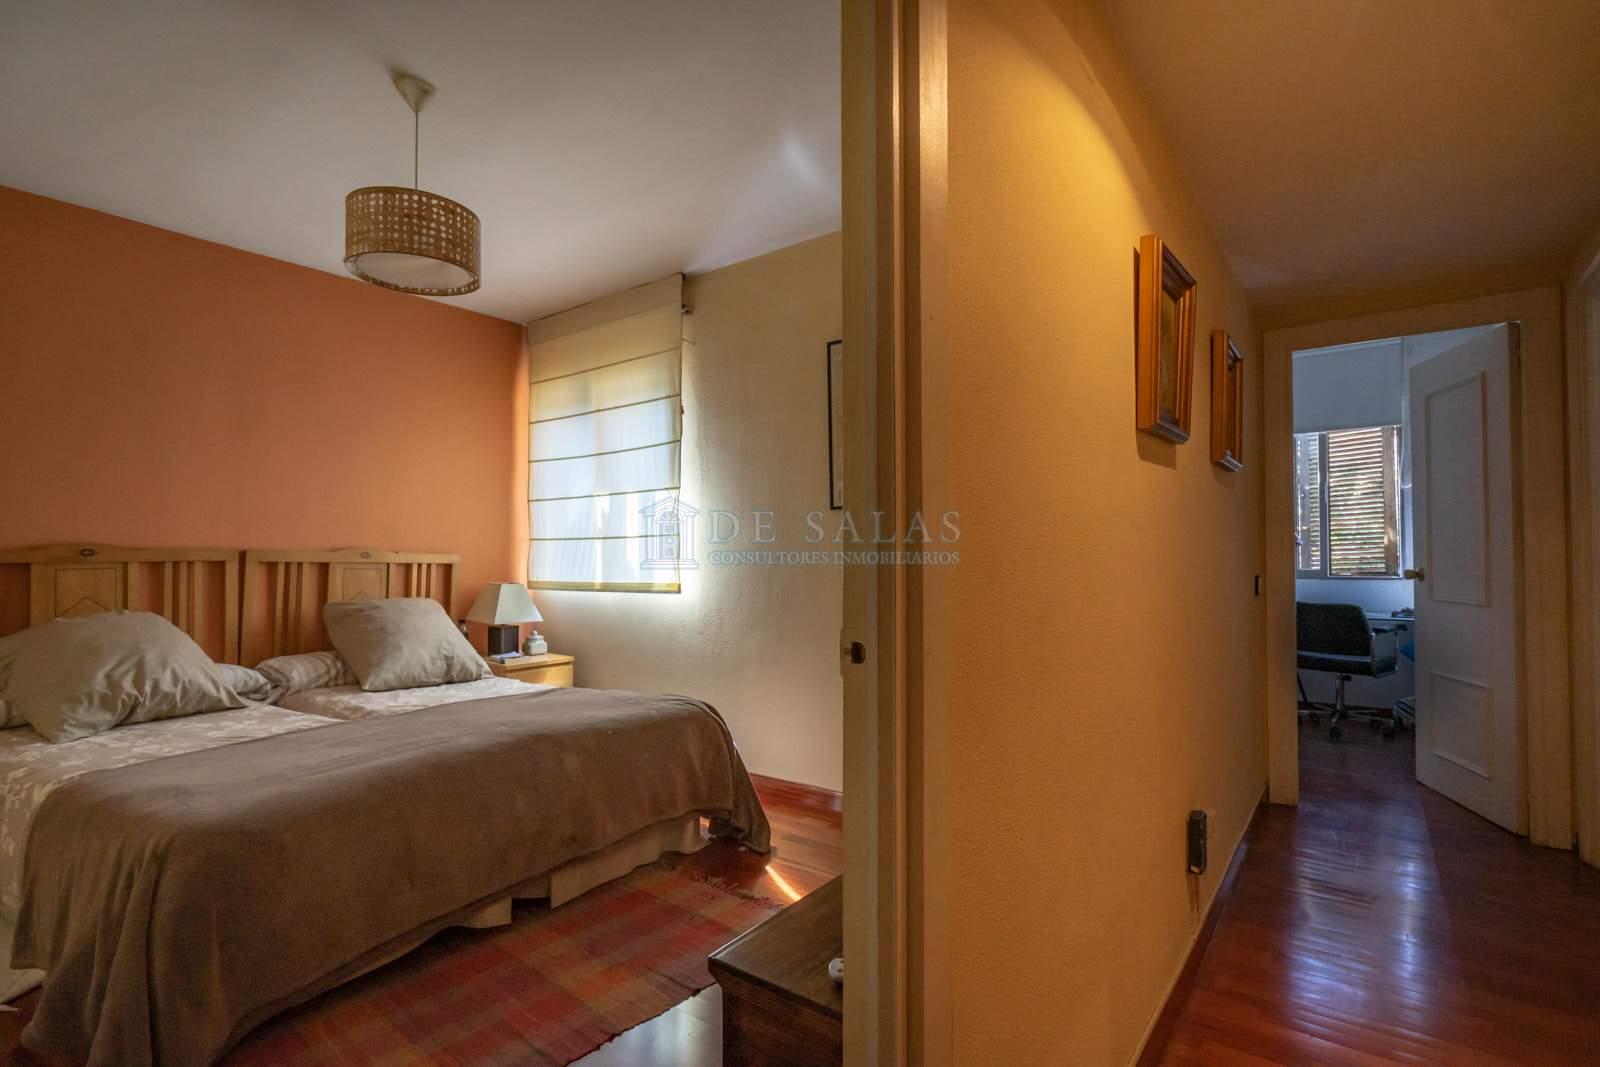 04-Dormitorio Piso Soto de la Moraleja